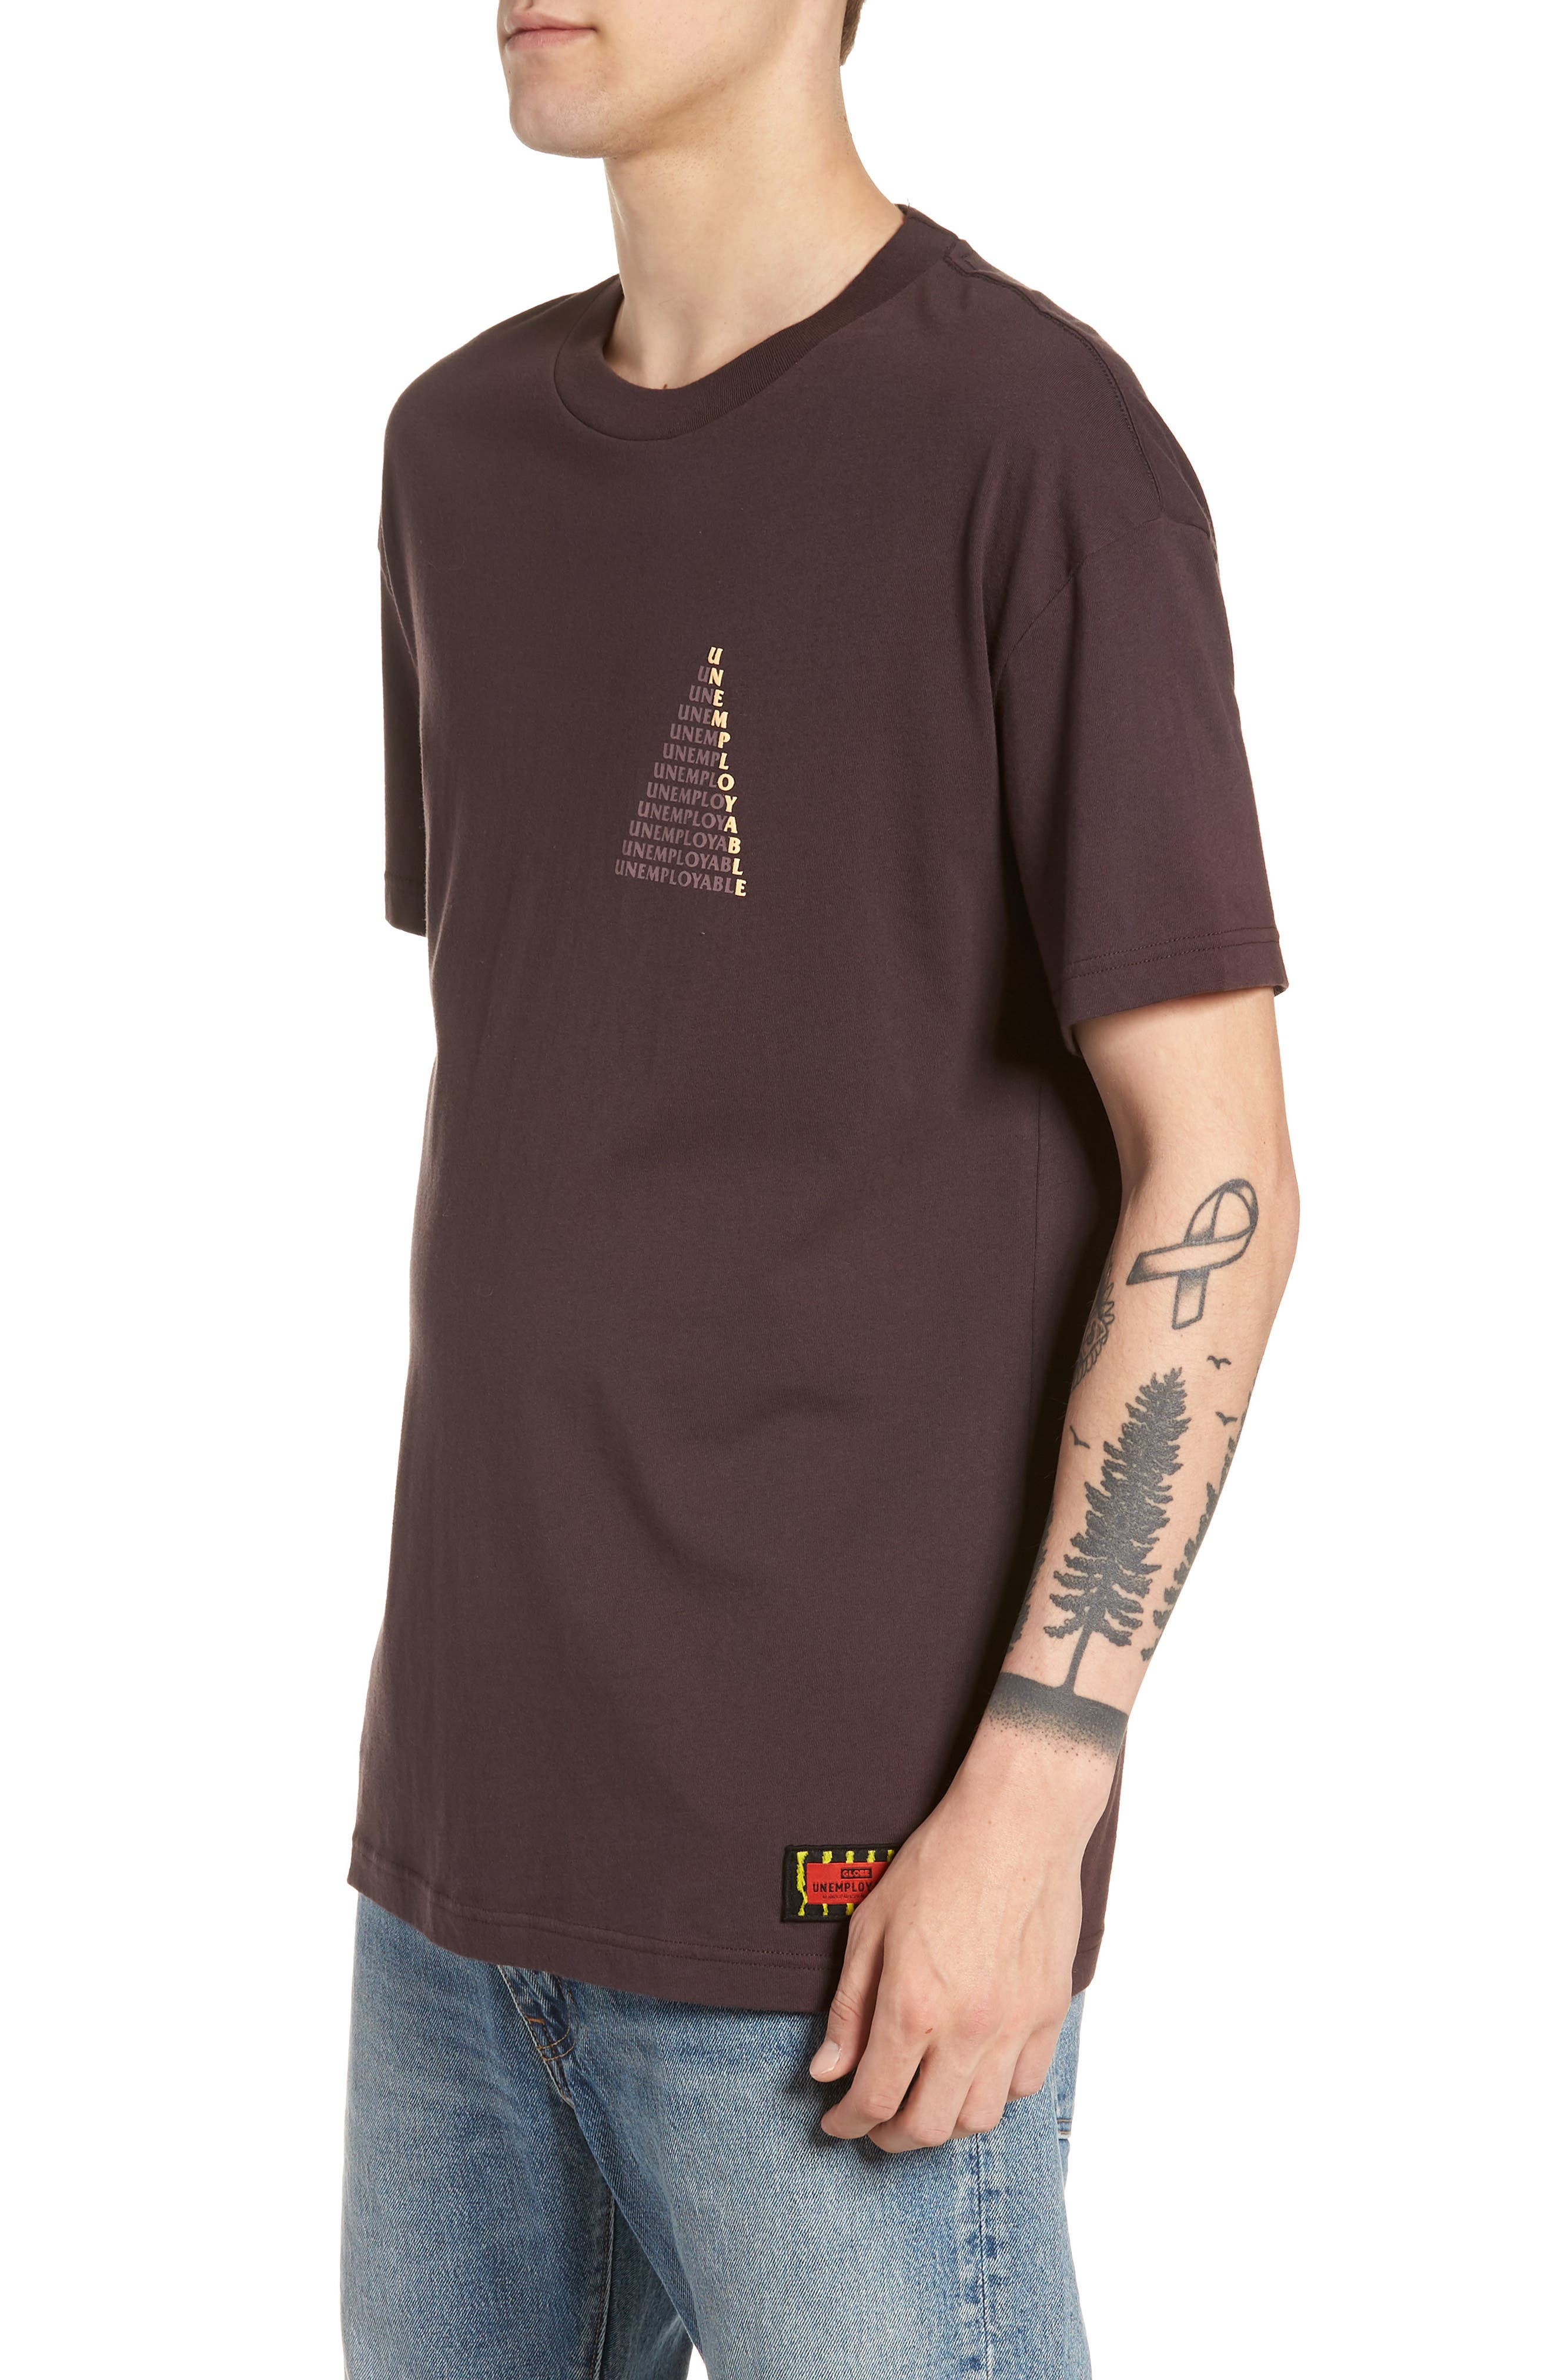 UE Pyramid T-Shirt,                             Alternate thumbnail 3, color,                             WINE